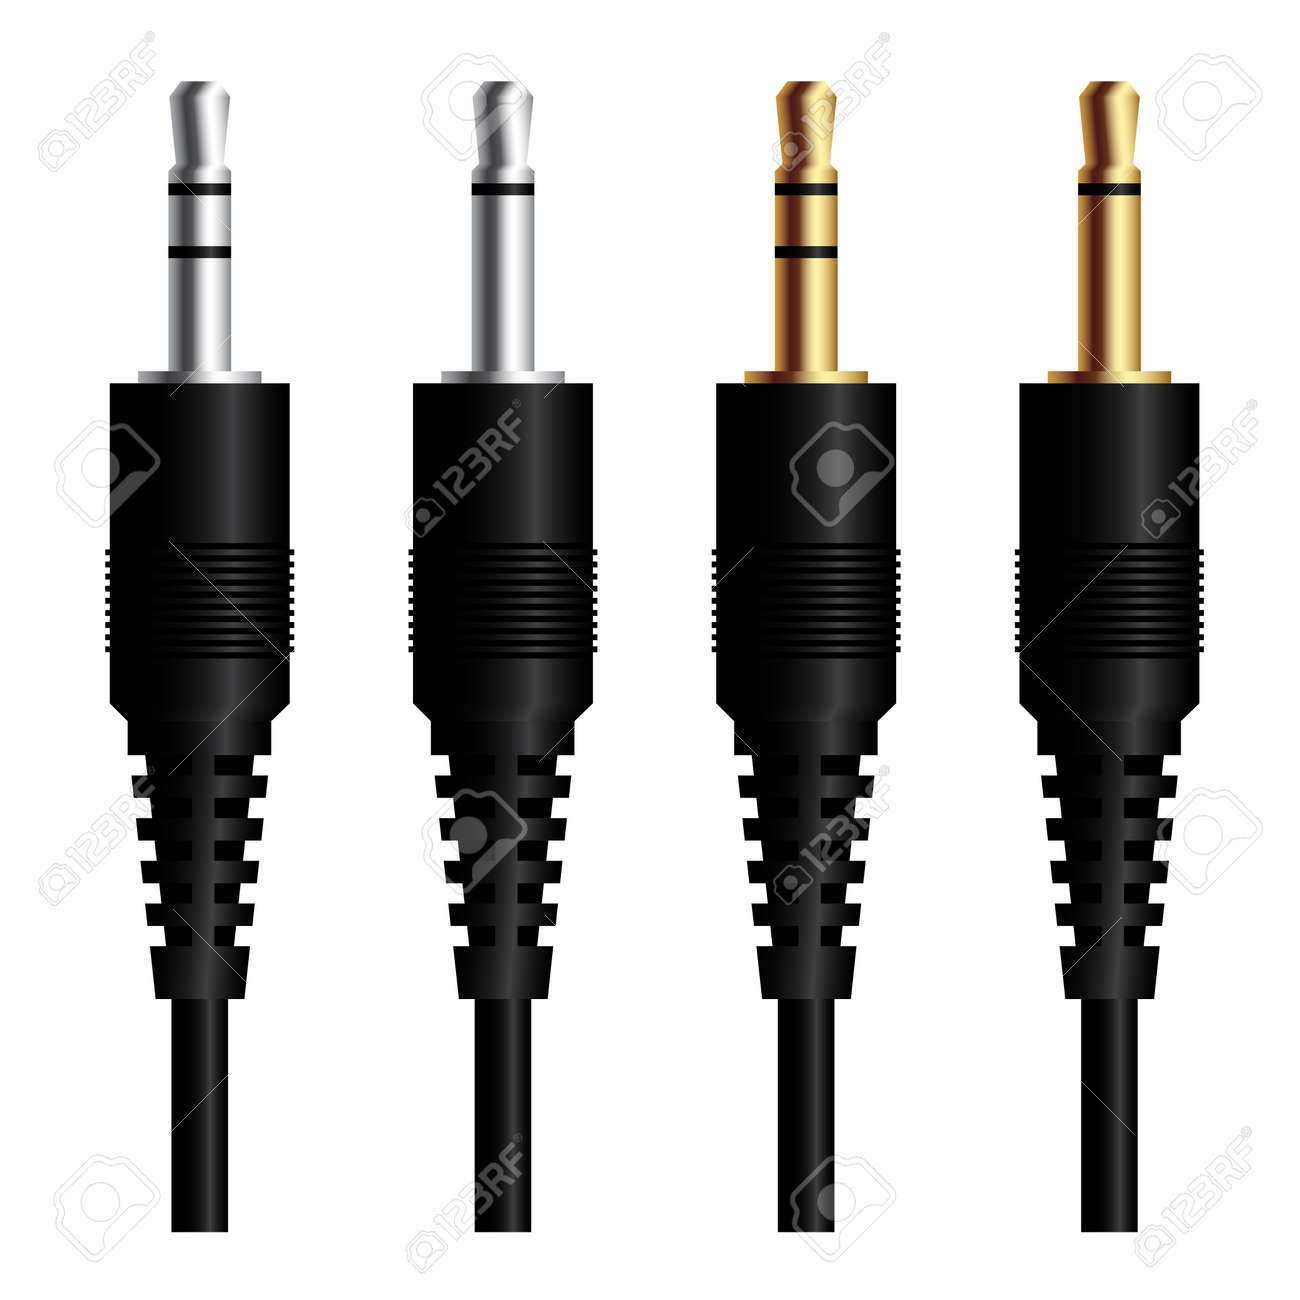 audio jack connector Silver gold Stock Vector - 17712267